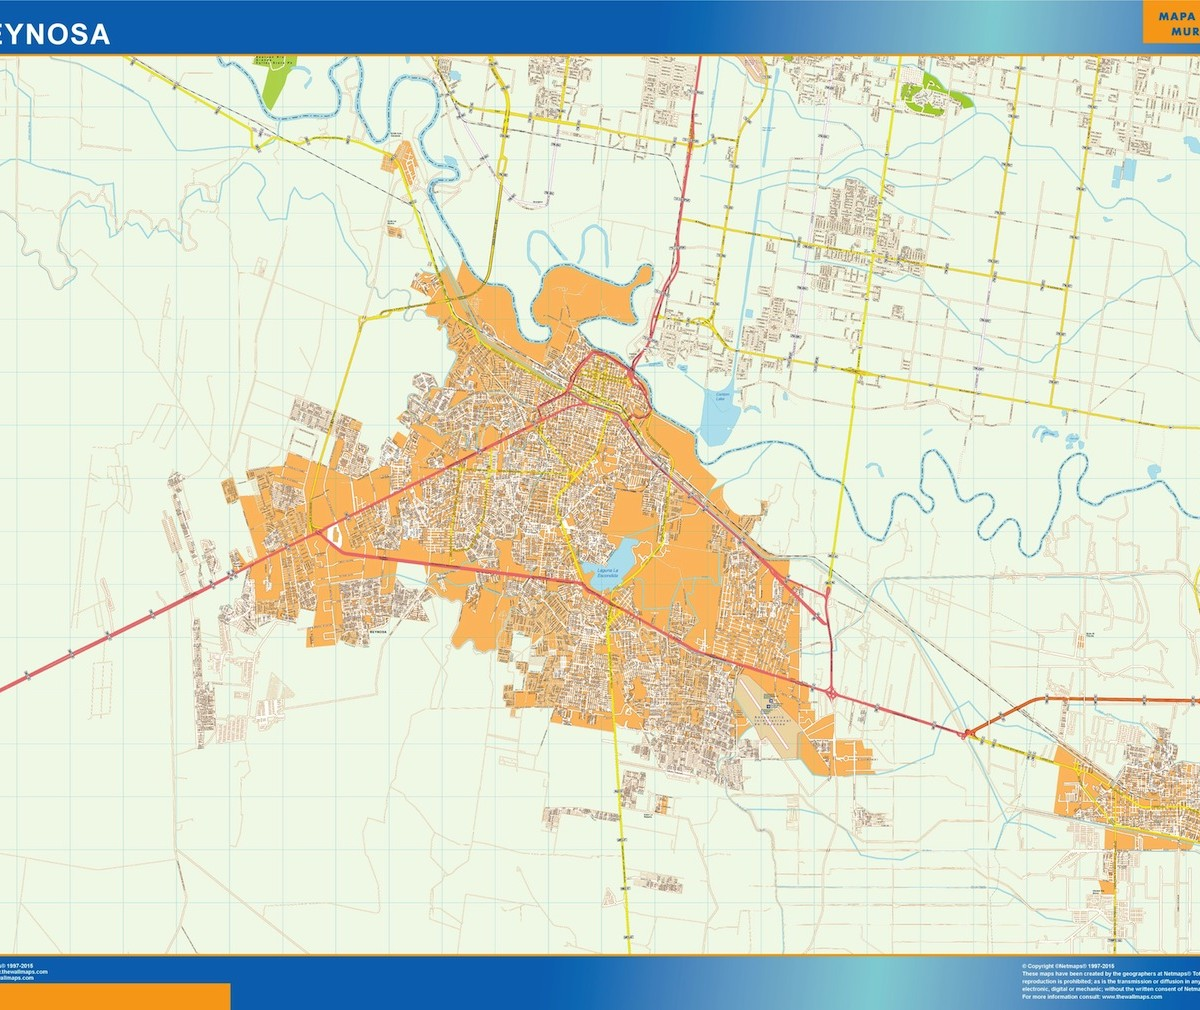 mapa Reynosa Our cartographers have made mapa Reynosa